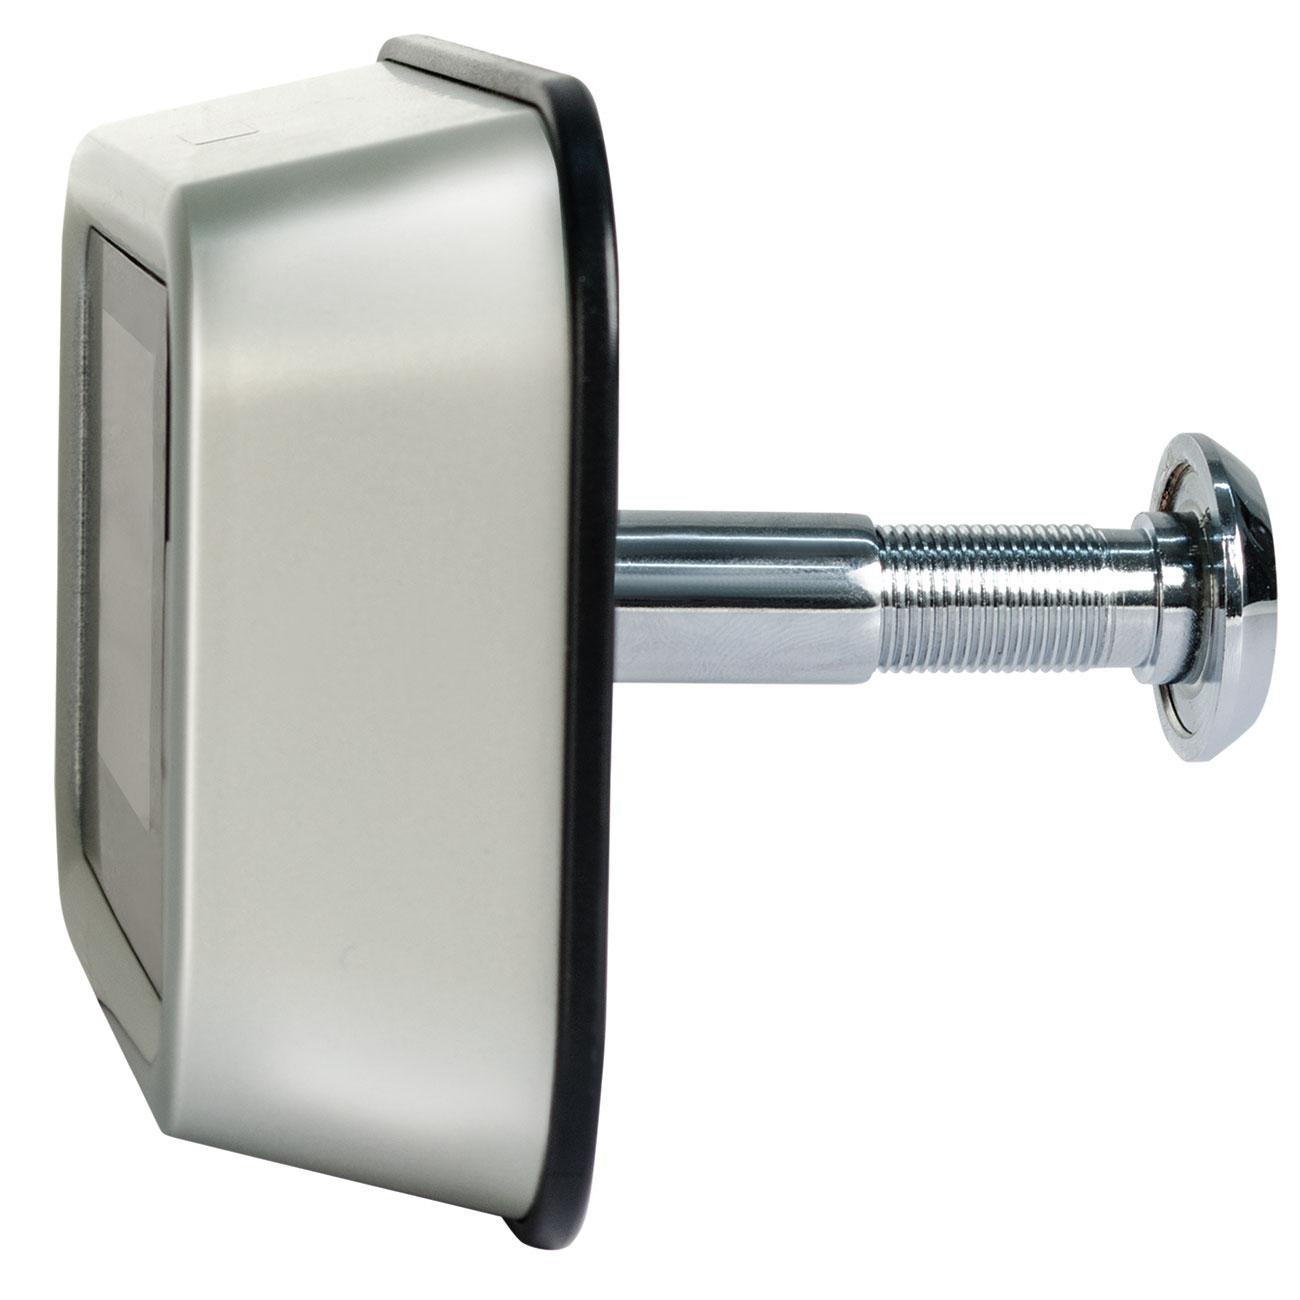 U.S. Patrol Digital Door Peephole